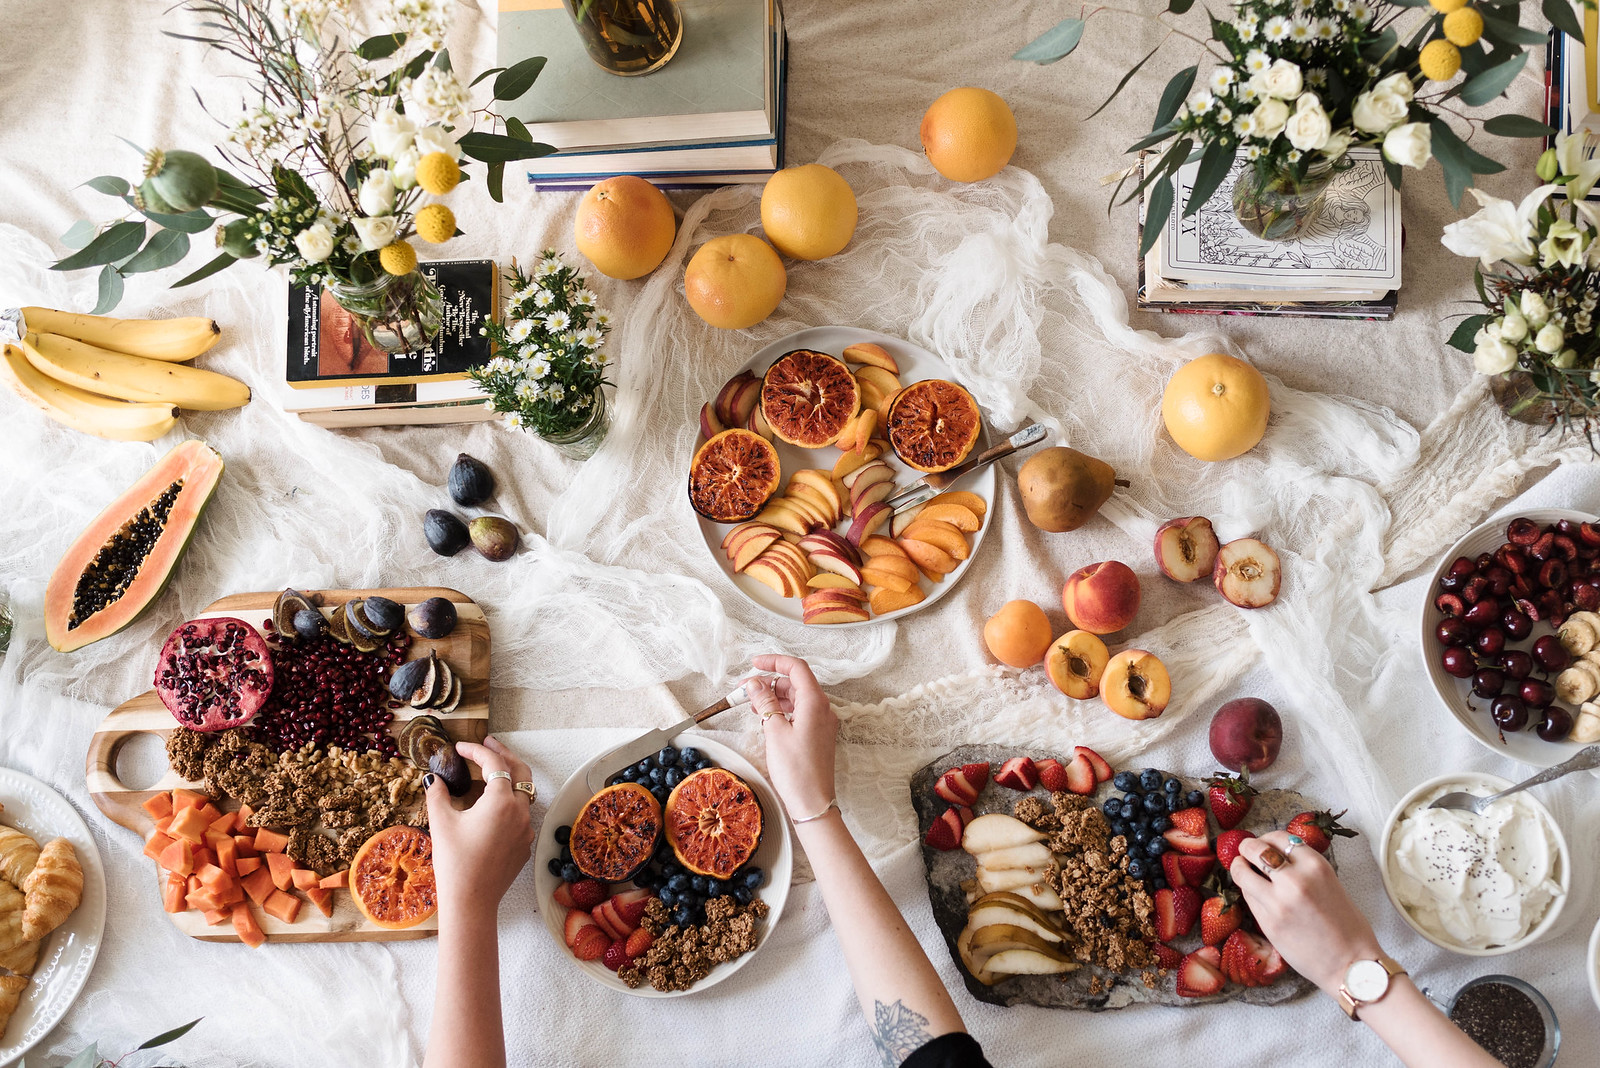 Yogurt Parfait Bar and Broiled Grapefruit Recipe on juliettelaura.blogspot.com